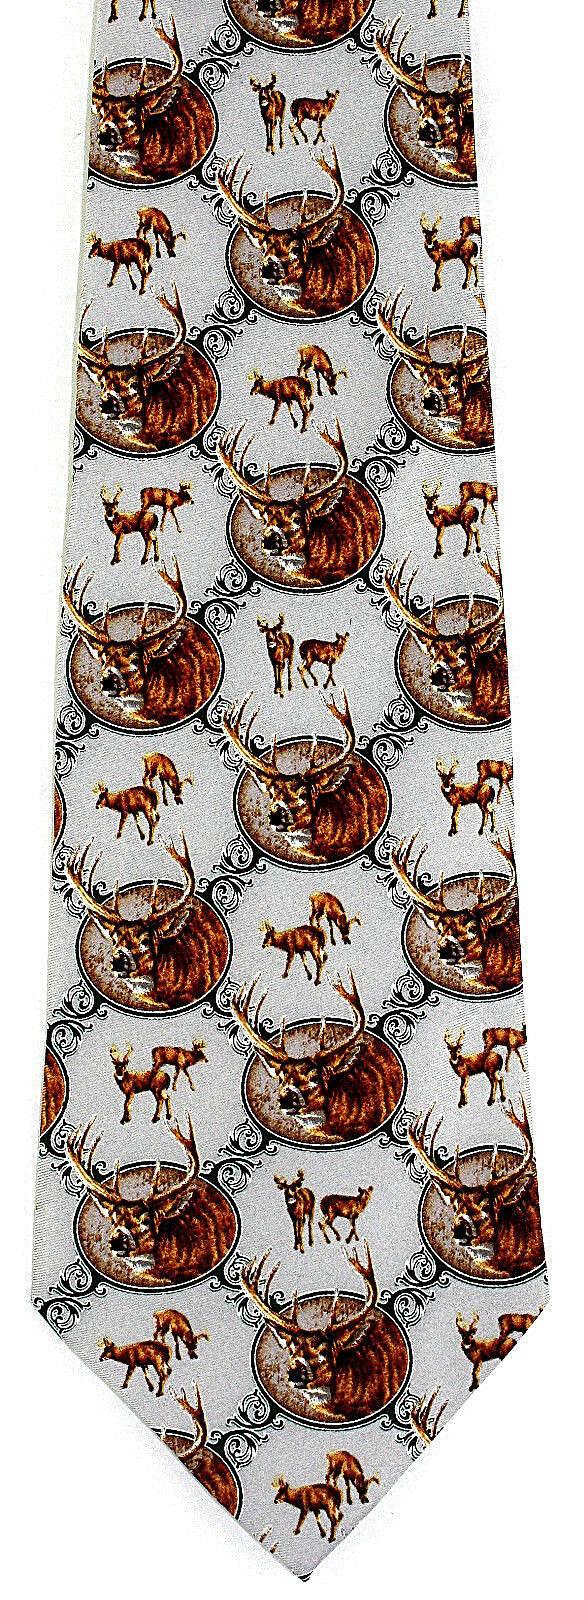 8 Point Buck Men's Neck Tie Deer Hunting Jon Q Wright Animal Silk Gray Necktie image 2